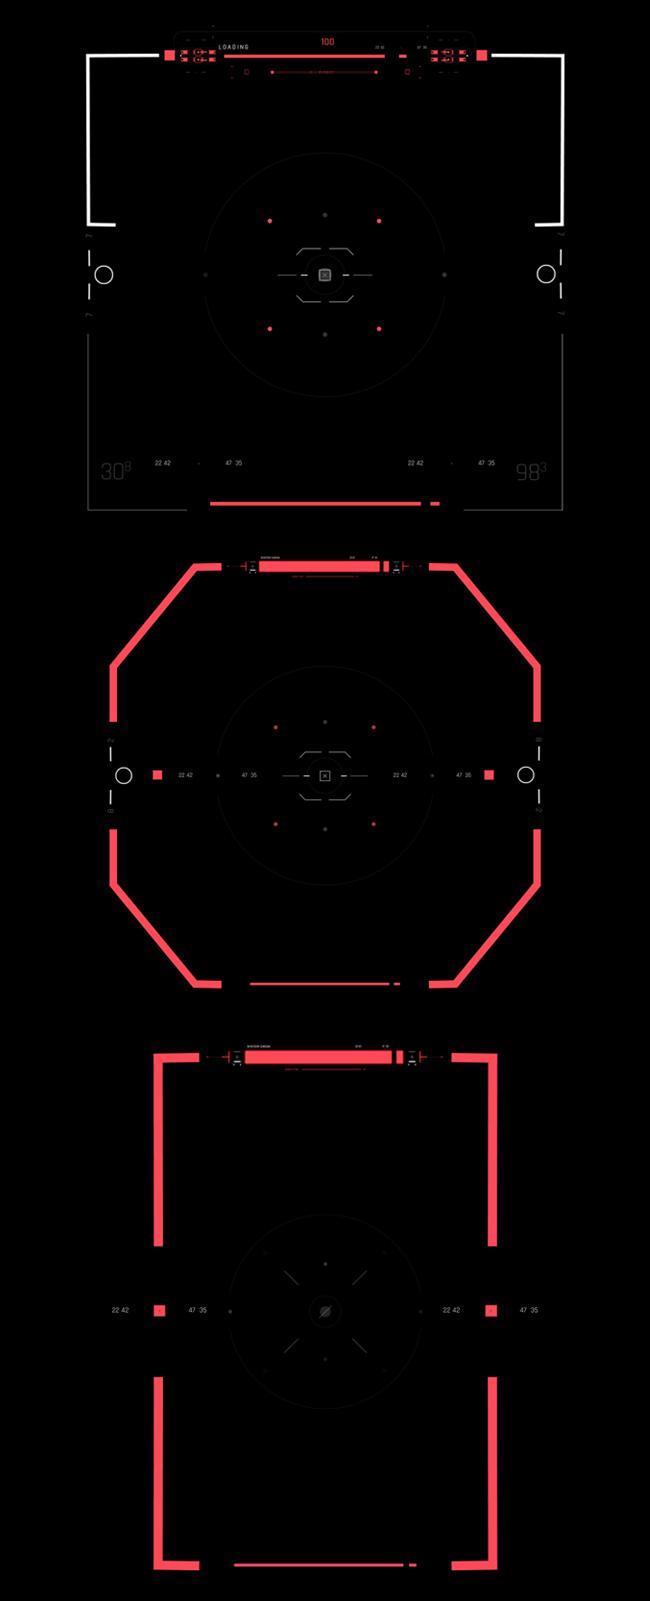 AE脚本-500个HUD高科技赛博朋克UI科幻界面元素动画预设包 Cyberpunk HUD UI 500+ 已修复中文版AE表达式报错插图20